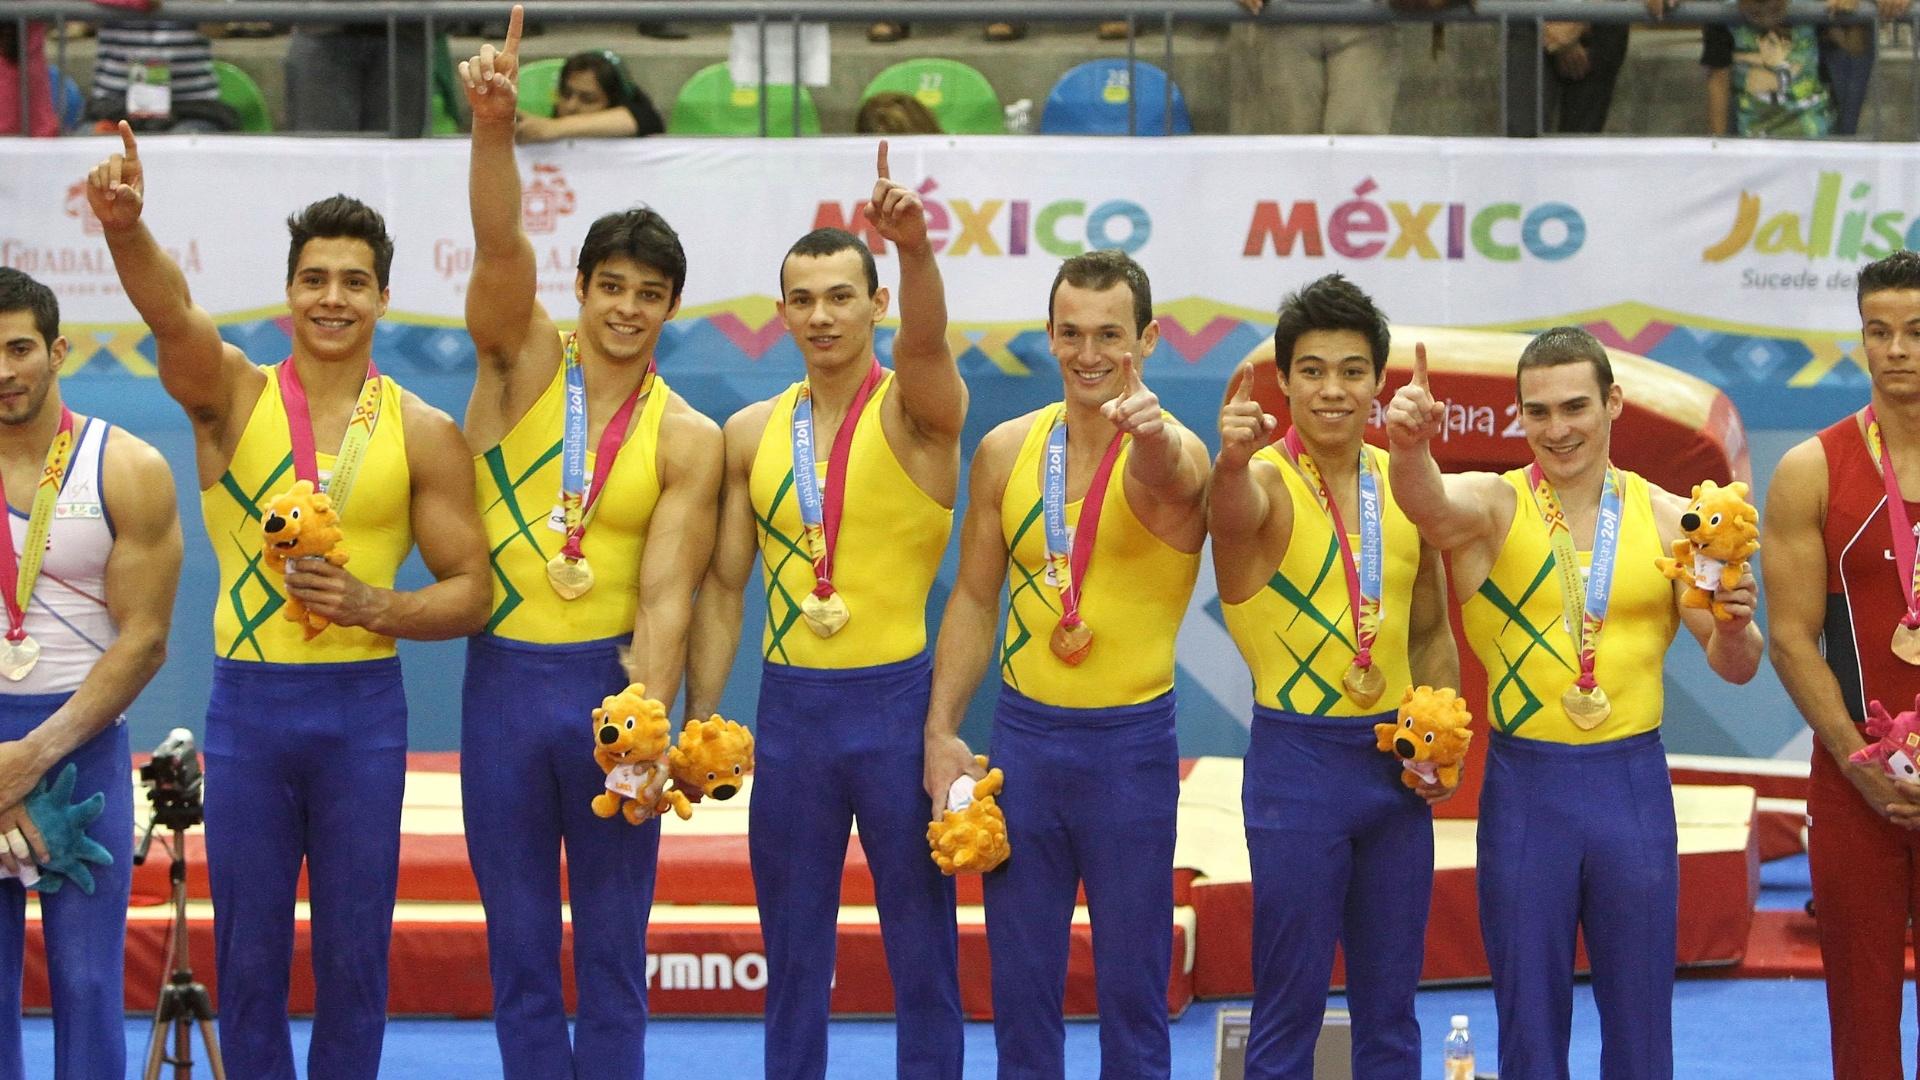 Equipe brasileira de ginástica artística sobe ao pódio para receber medalha de ouro (25/10/2011)